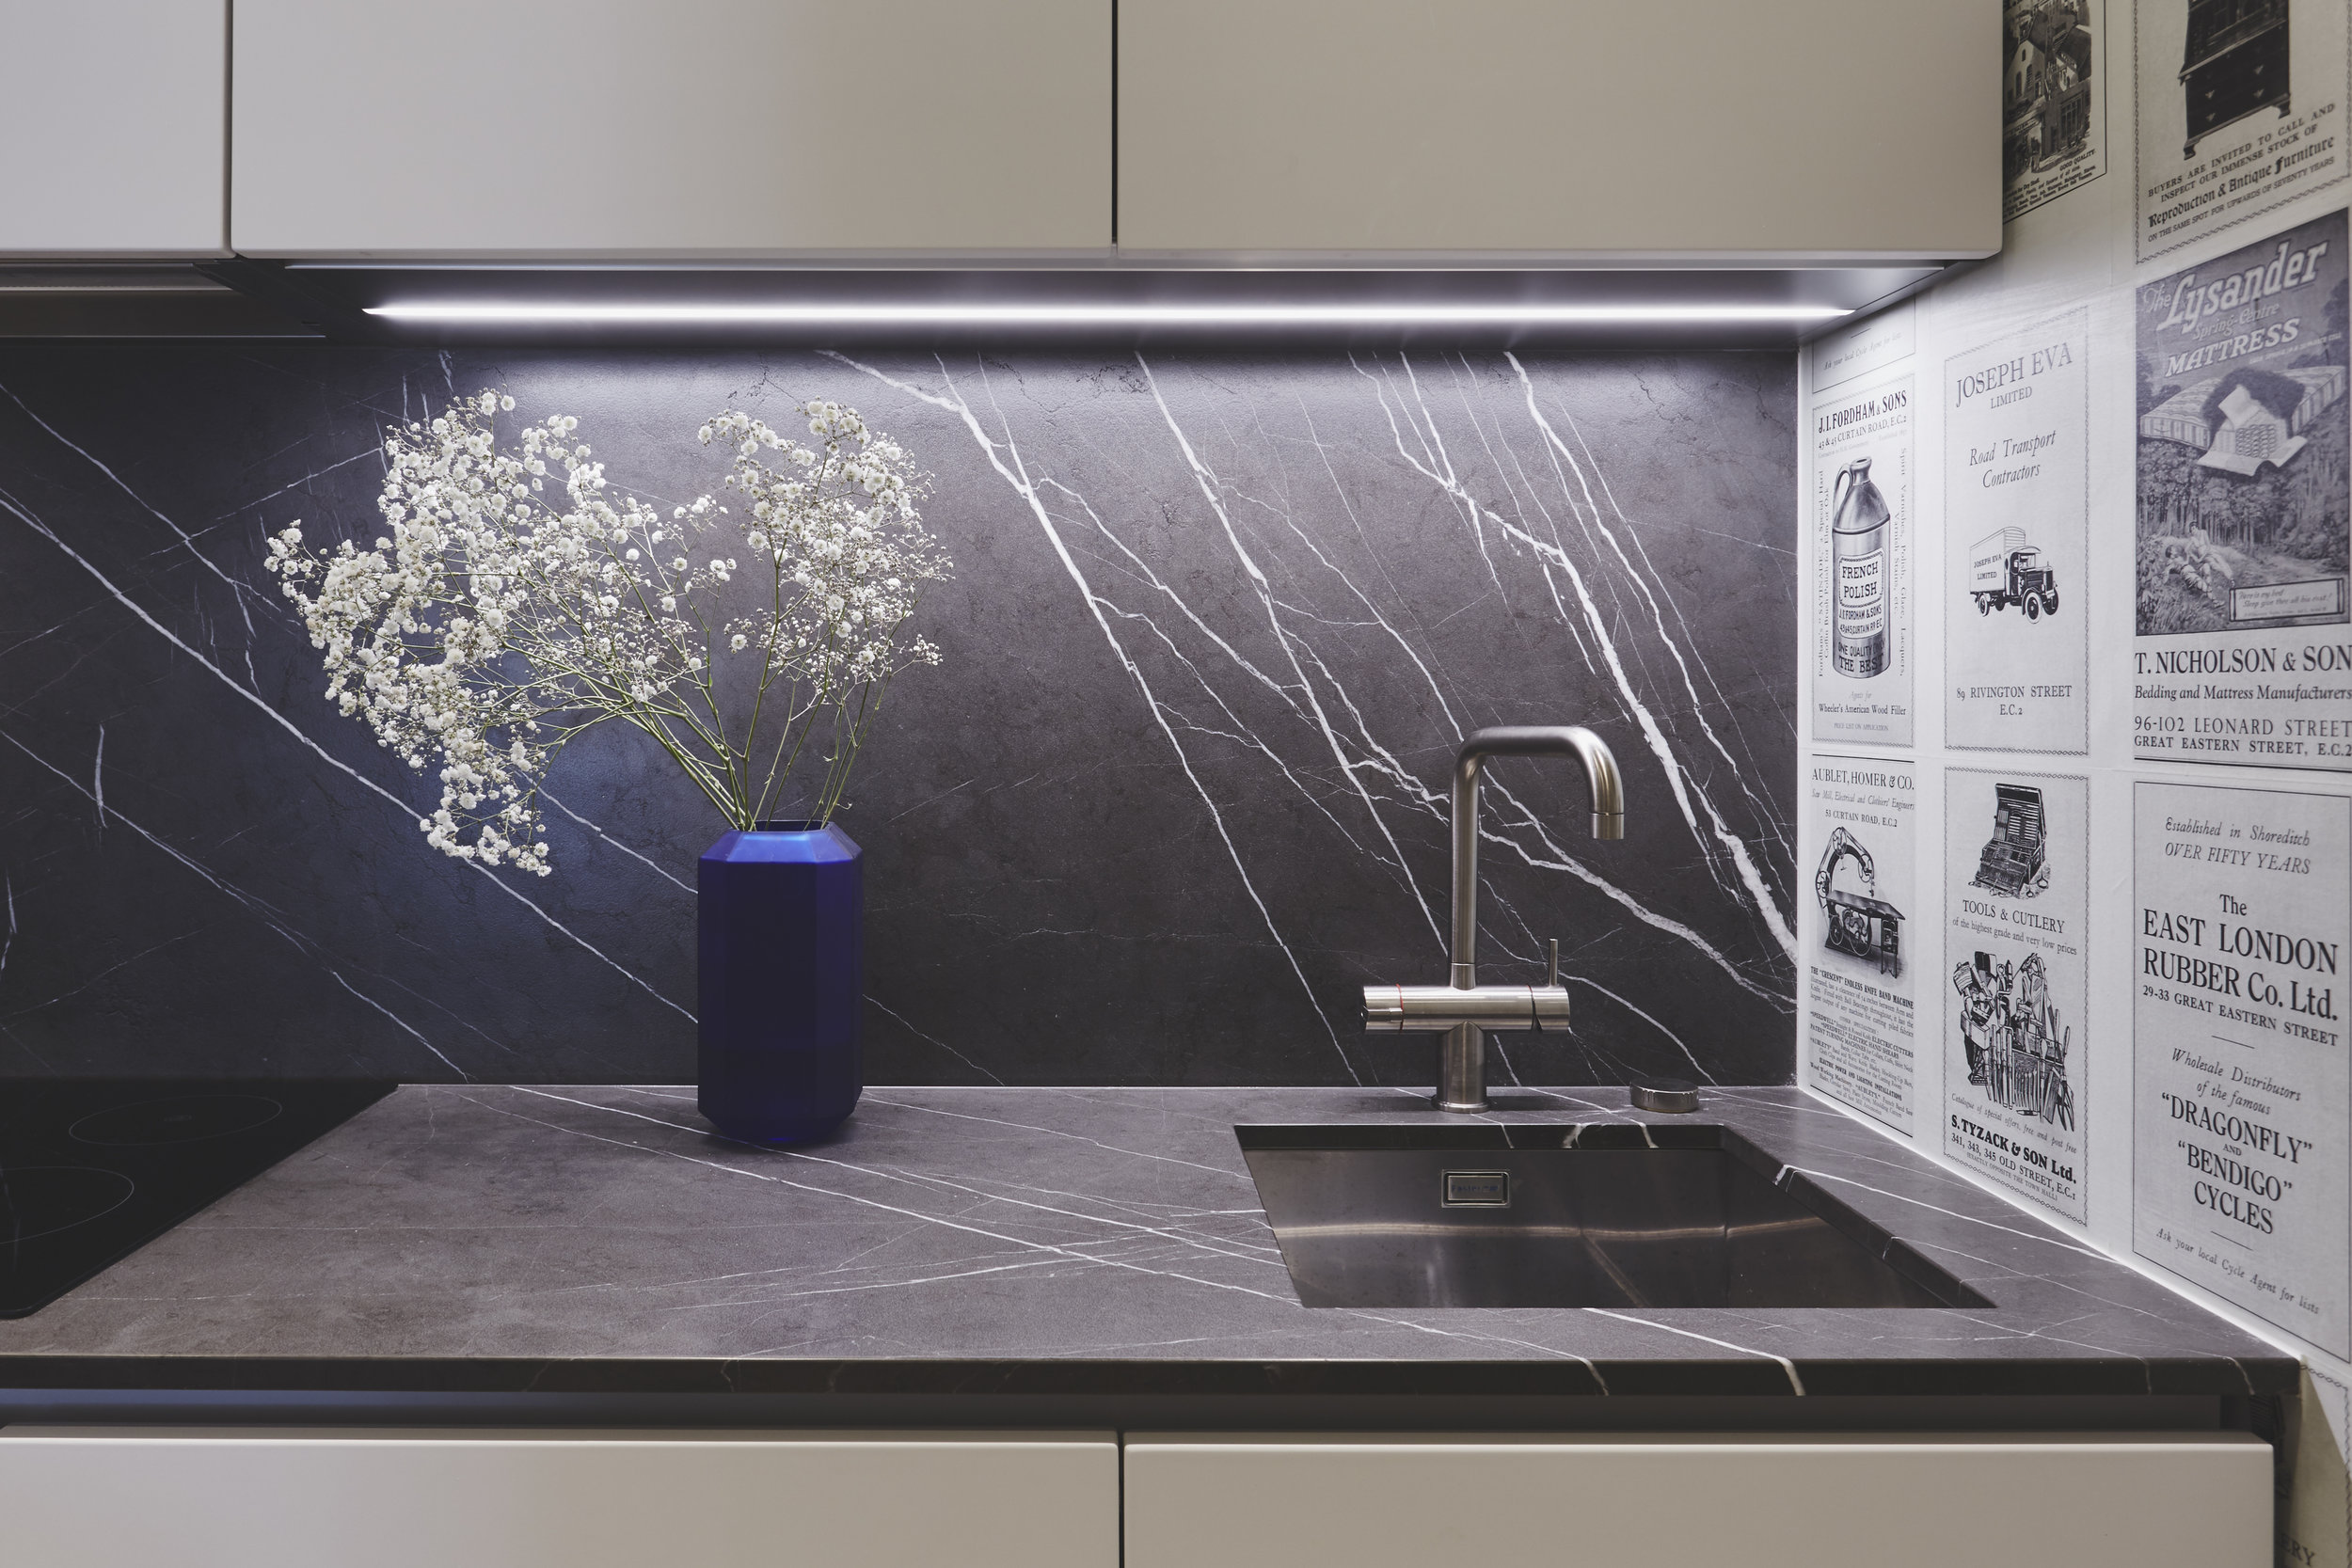 Stylish Kitchen Interiors Cuckooz Shoreditch Studionatalie Natalie Papageorgiadis